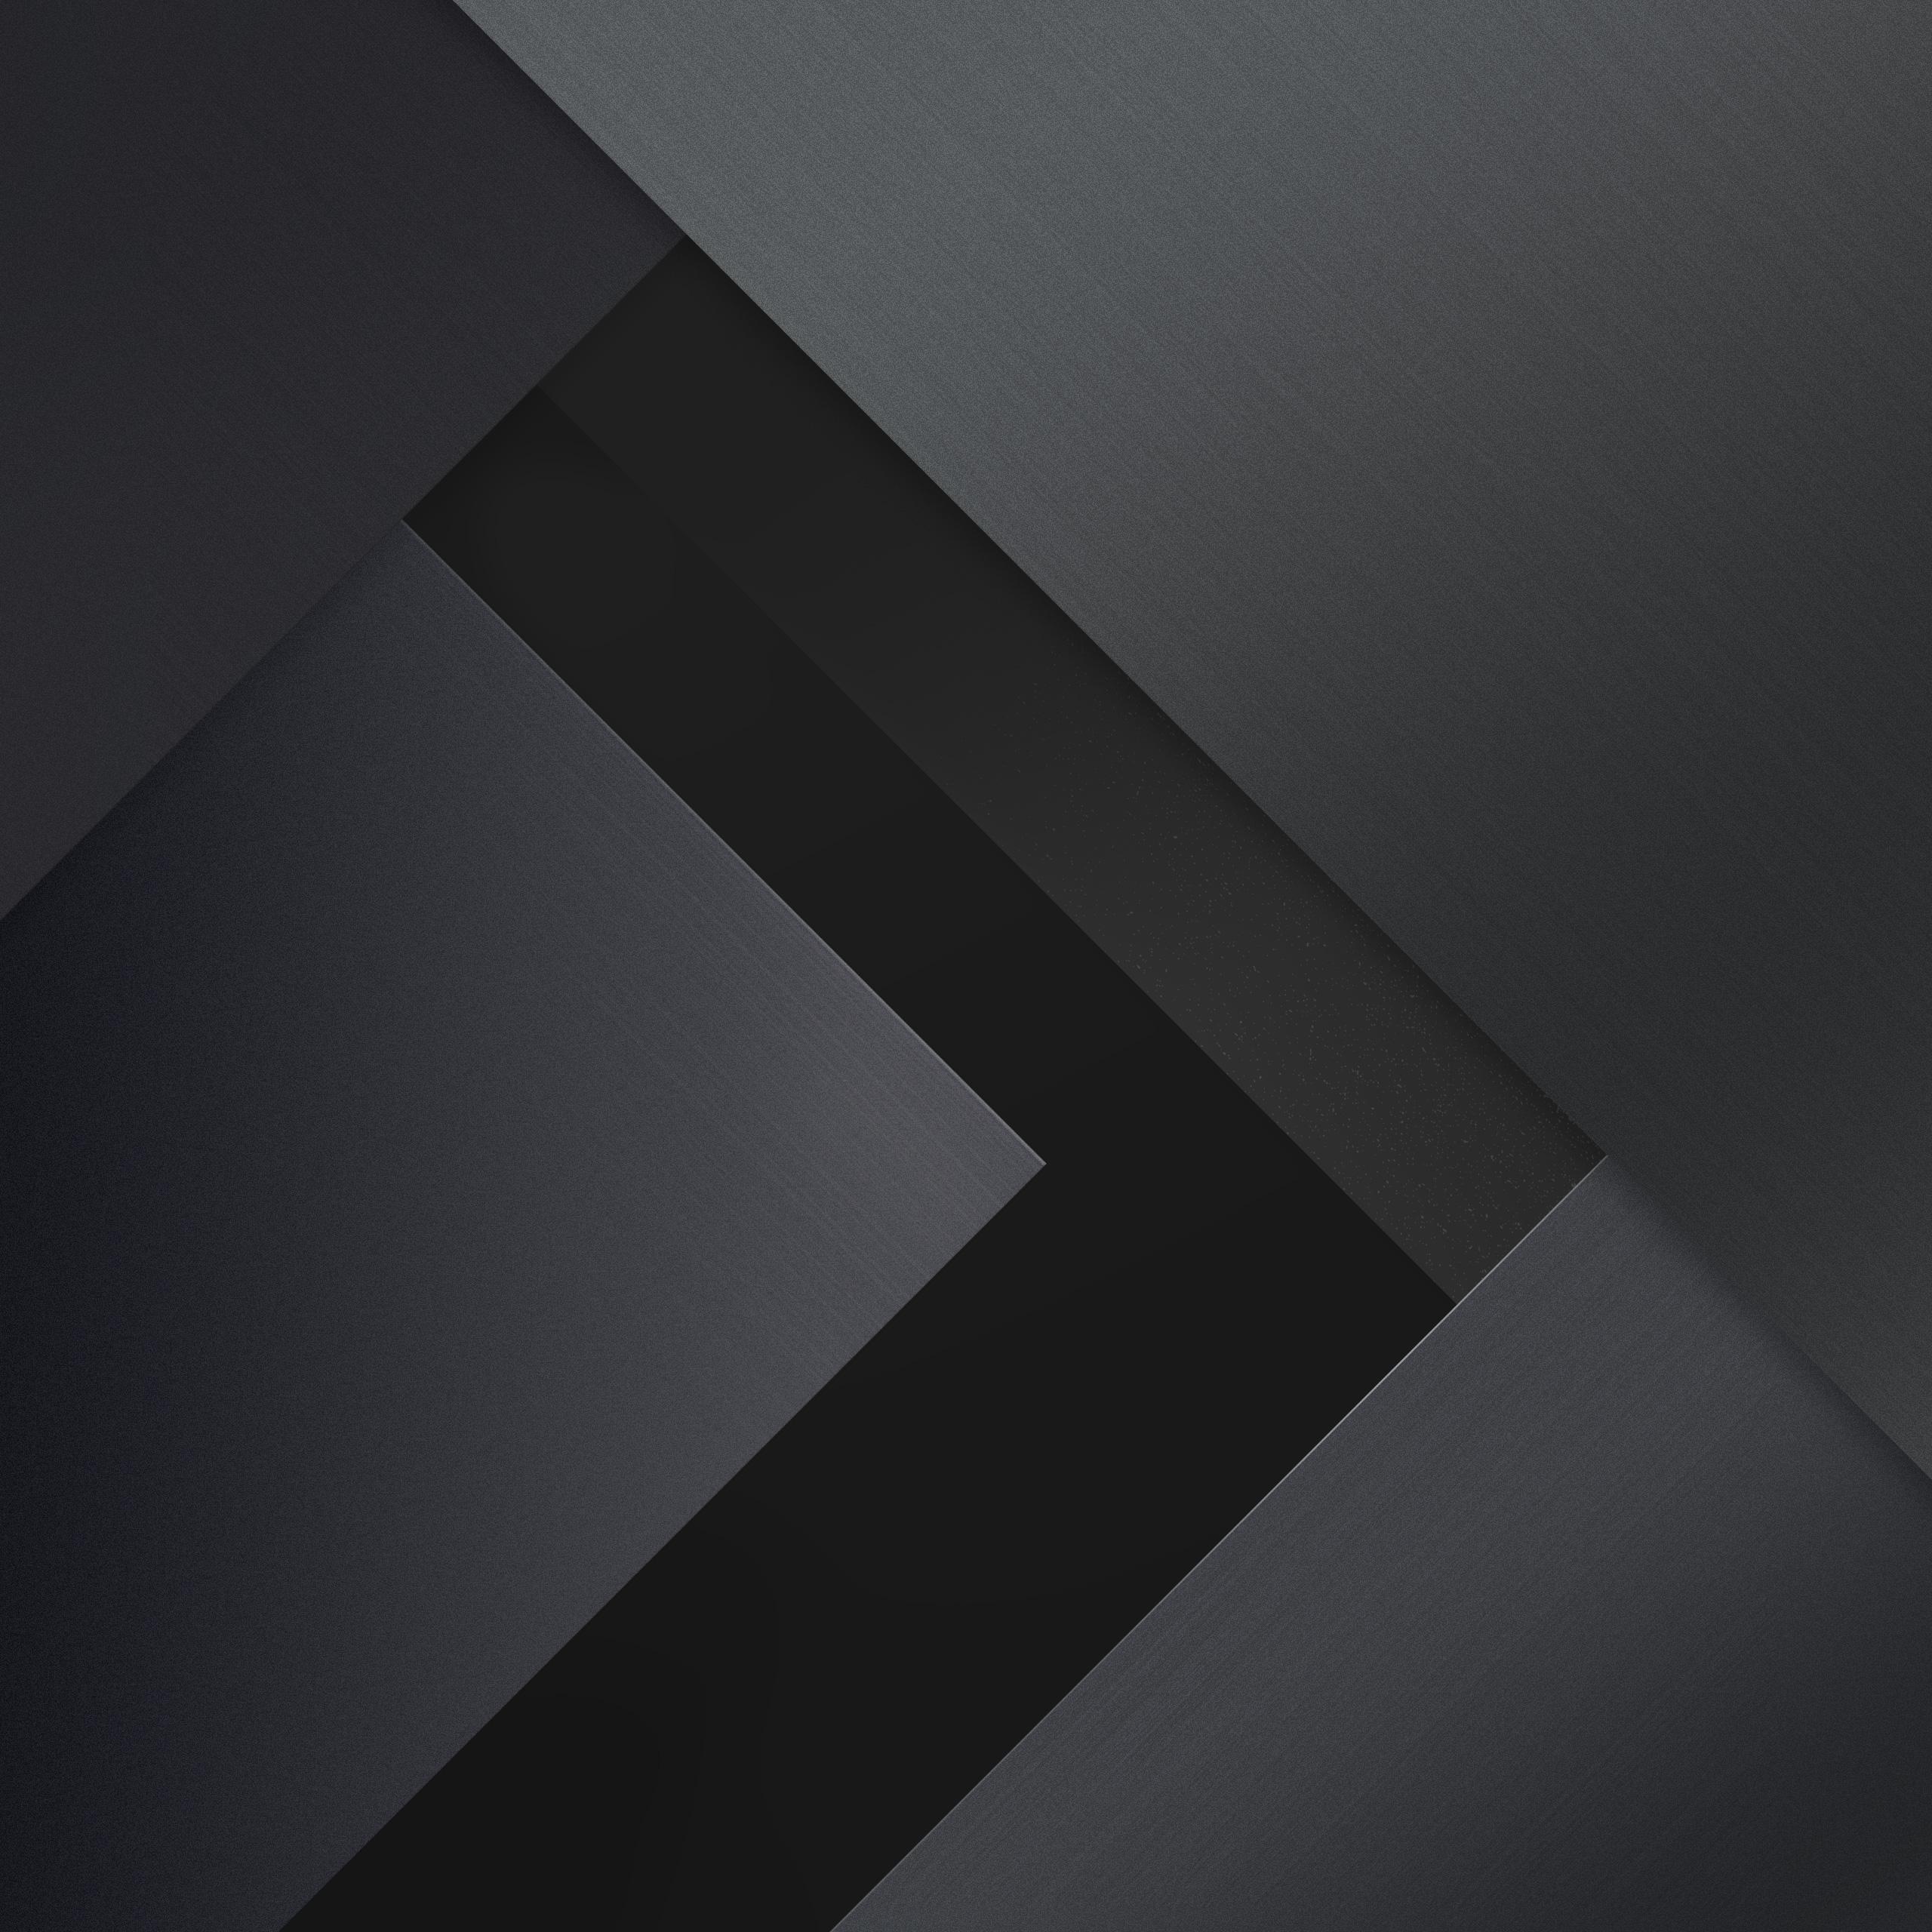 Galaxy S7 wallpaper 3